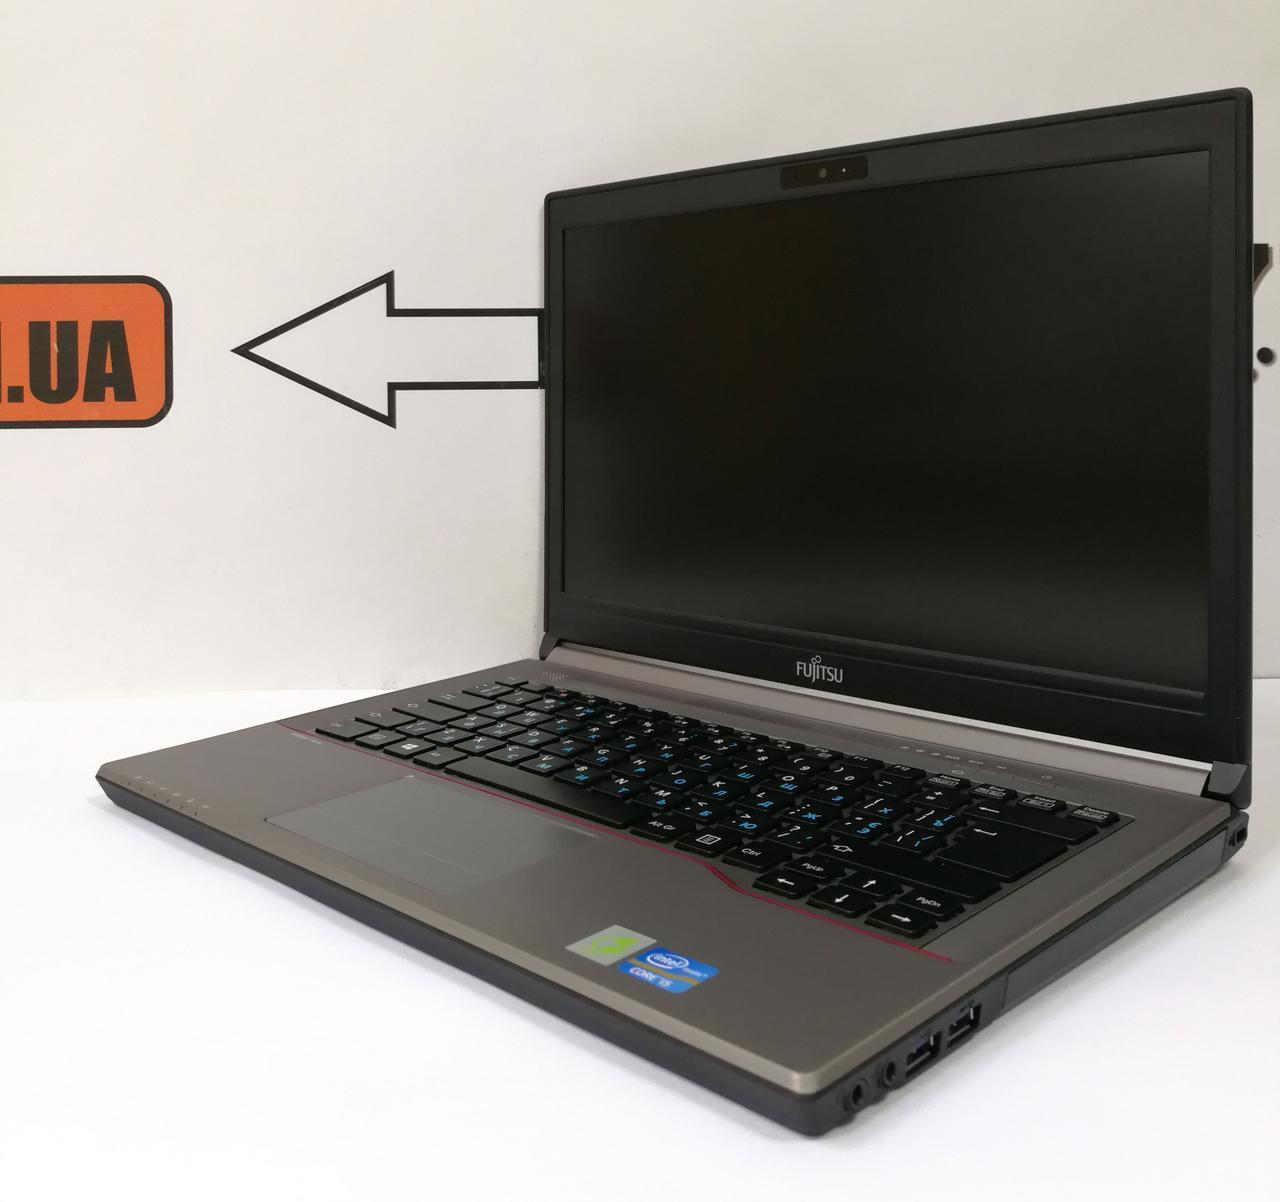 "Ноутбук Fujitsu LifeBook E743, 14"", Intel Core i5-3230M 3.2GHz, RAM 4ГБ, SSD 120ГБ (HDD 500ГБ)"